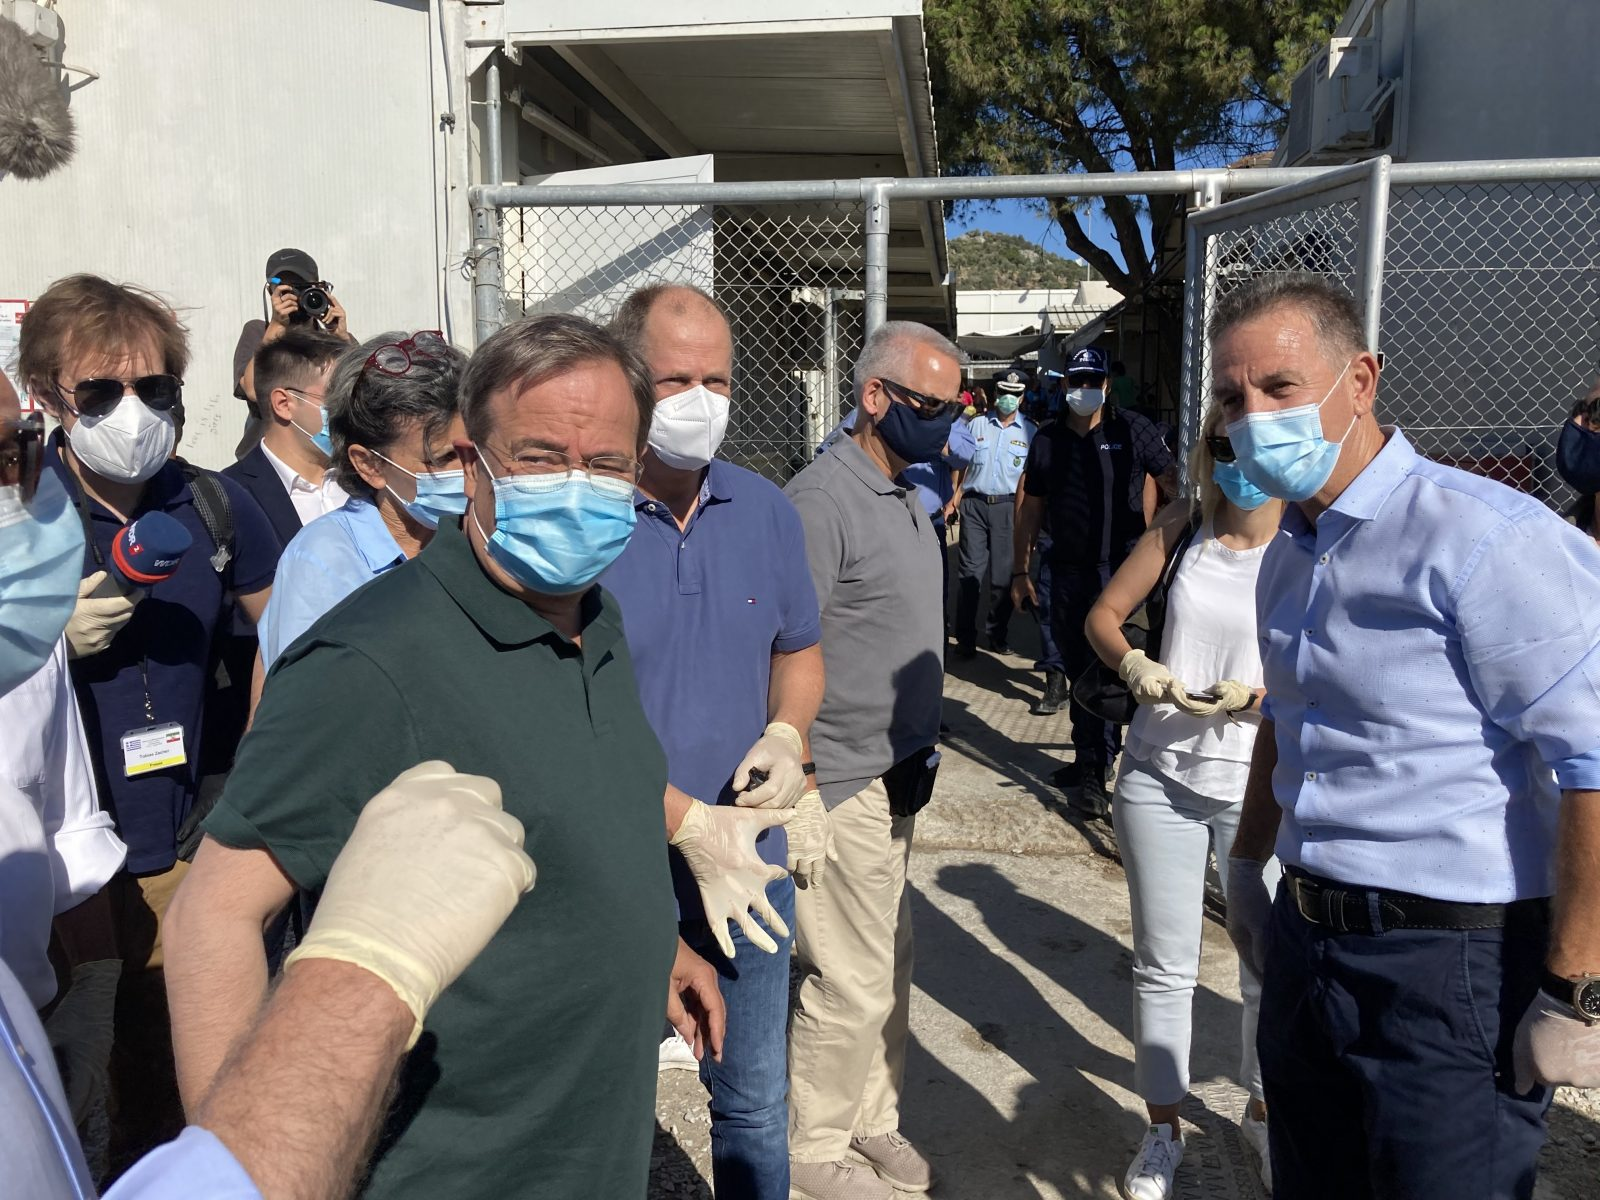 Nordrhein-Westfalens Ministerpräsident Armin Laschet (CDU) läßt sich durch das Flüchtlingslager führen Foto: picture alliance/Dorothea Hülsmeier/dpa